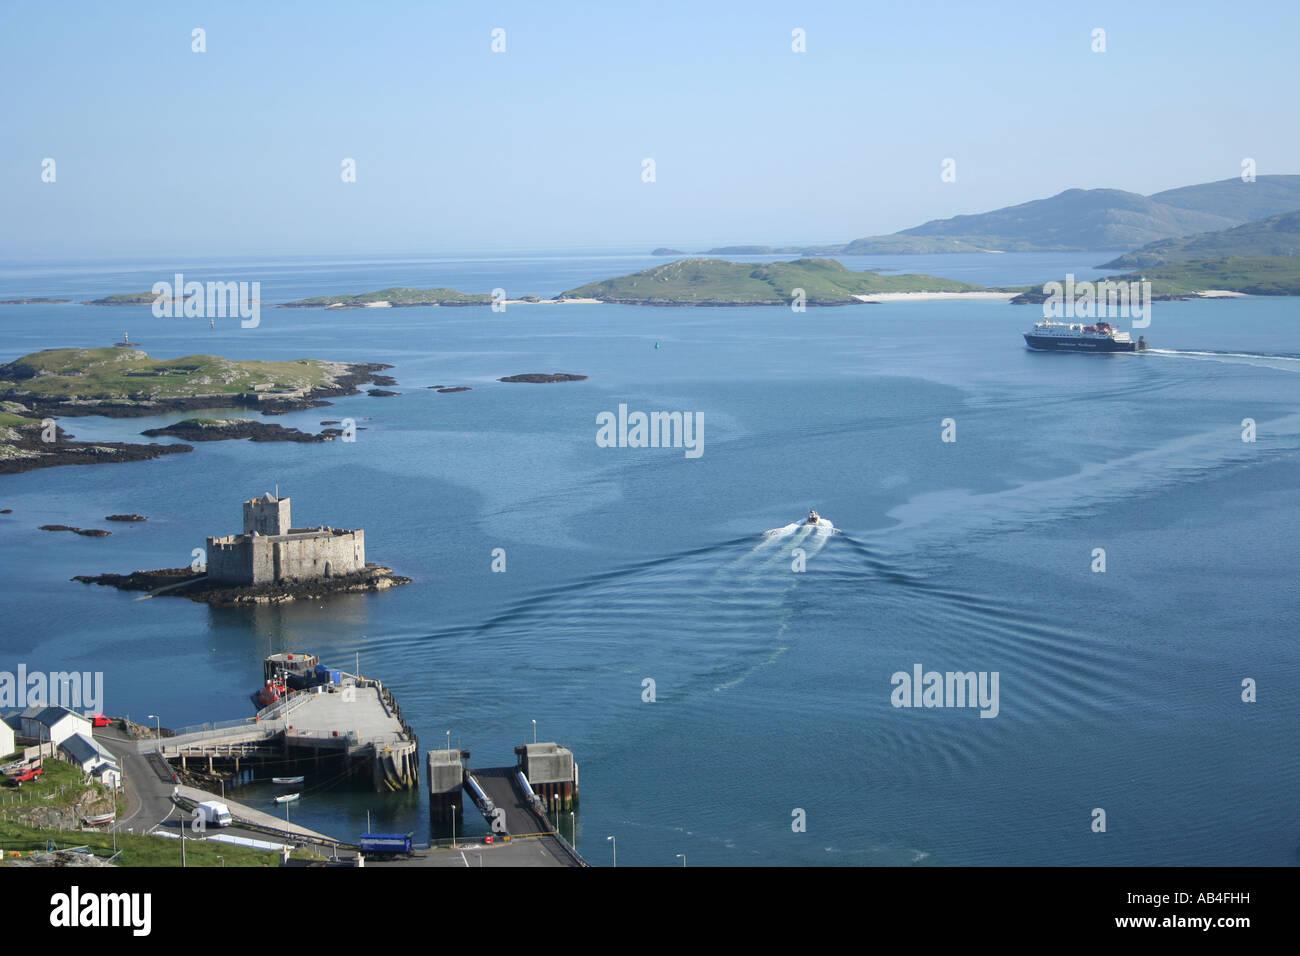 Clansman part of the Caledonian MacBrayne fleet leaving Castlebay with Kisimul castle isle of Barra Scotland  June - Stock Image